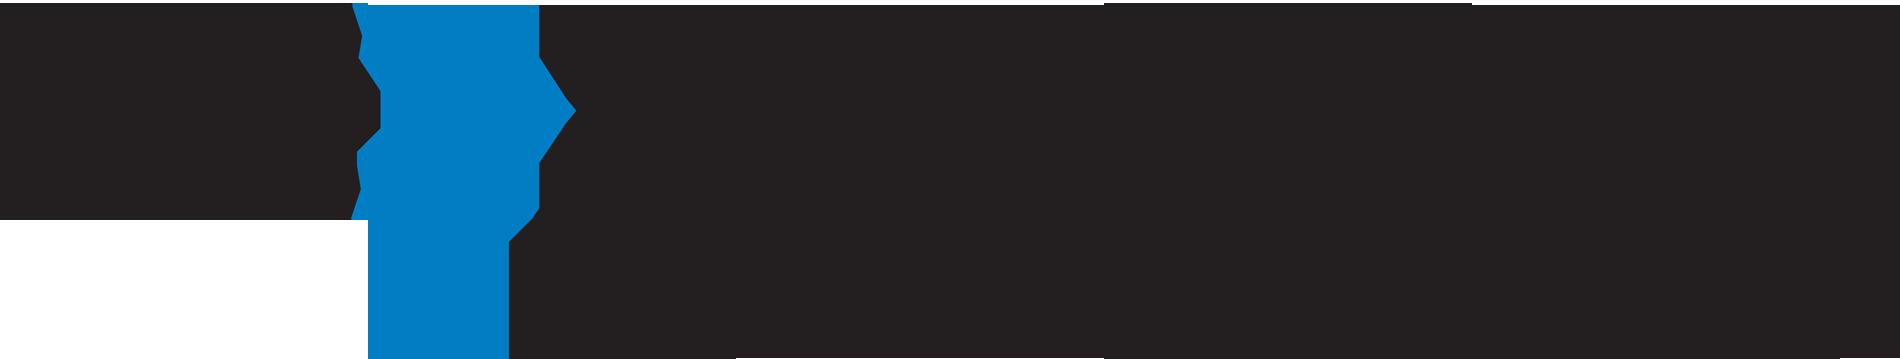 logo-nextworks-2.png